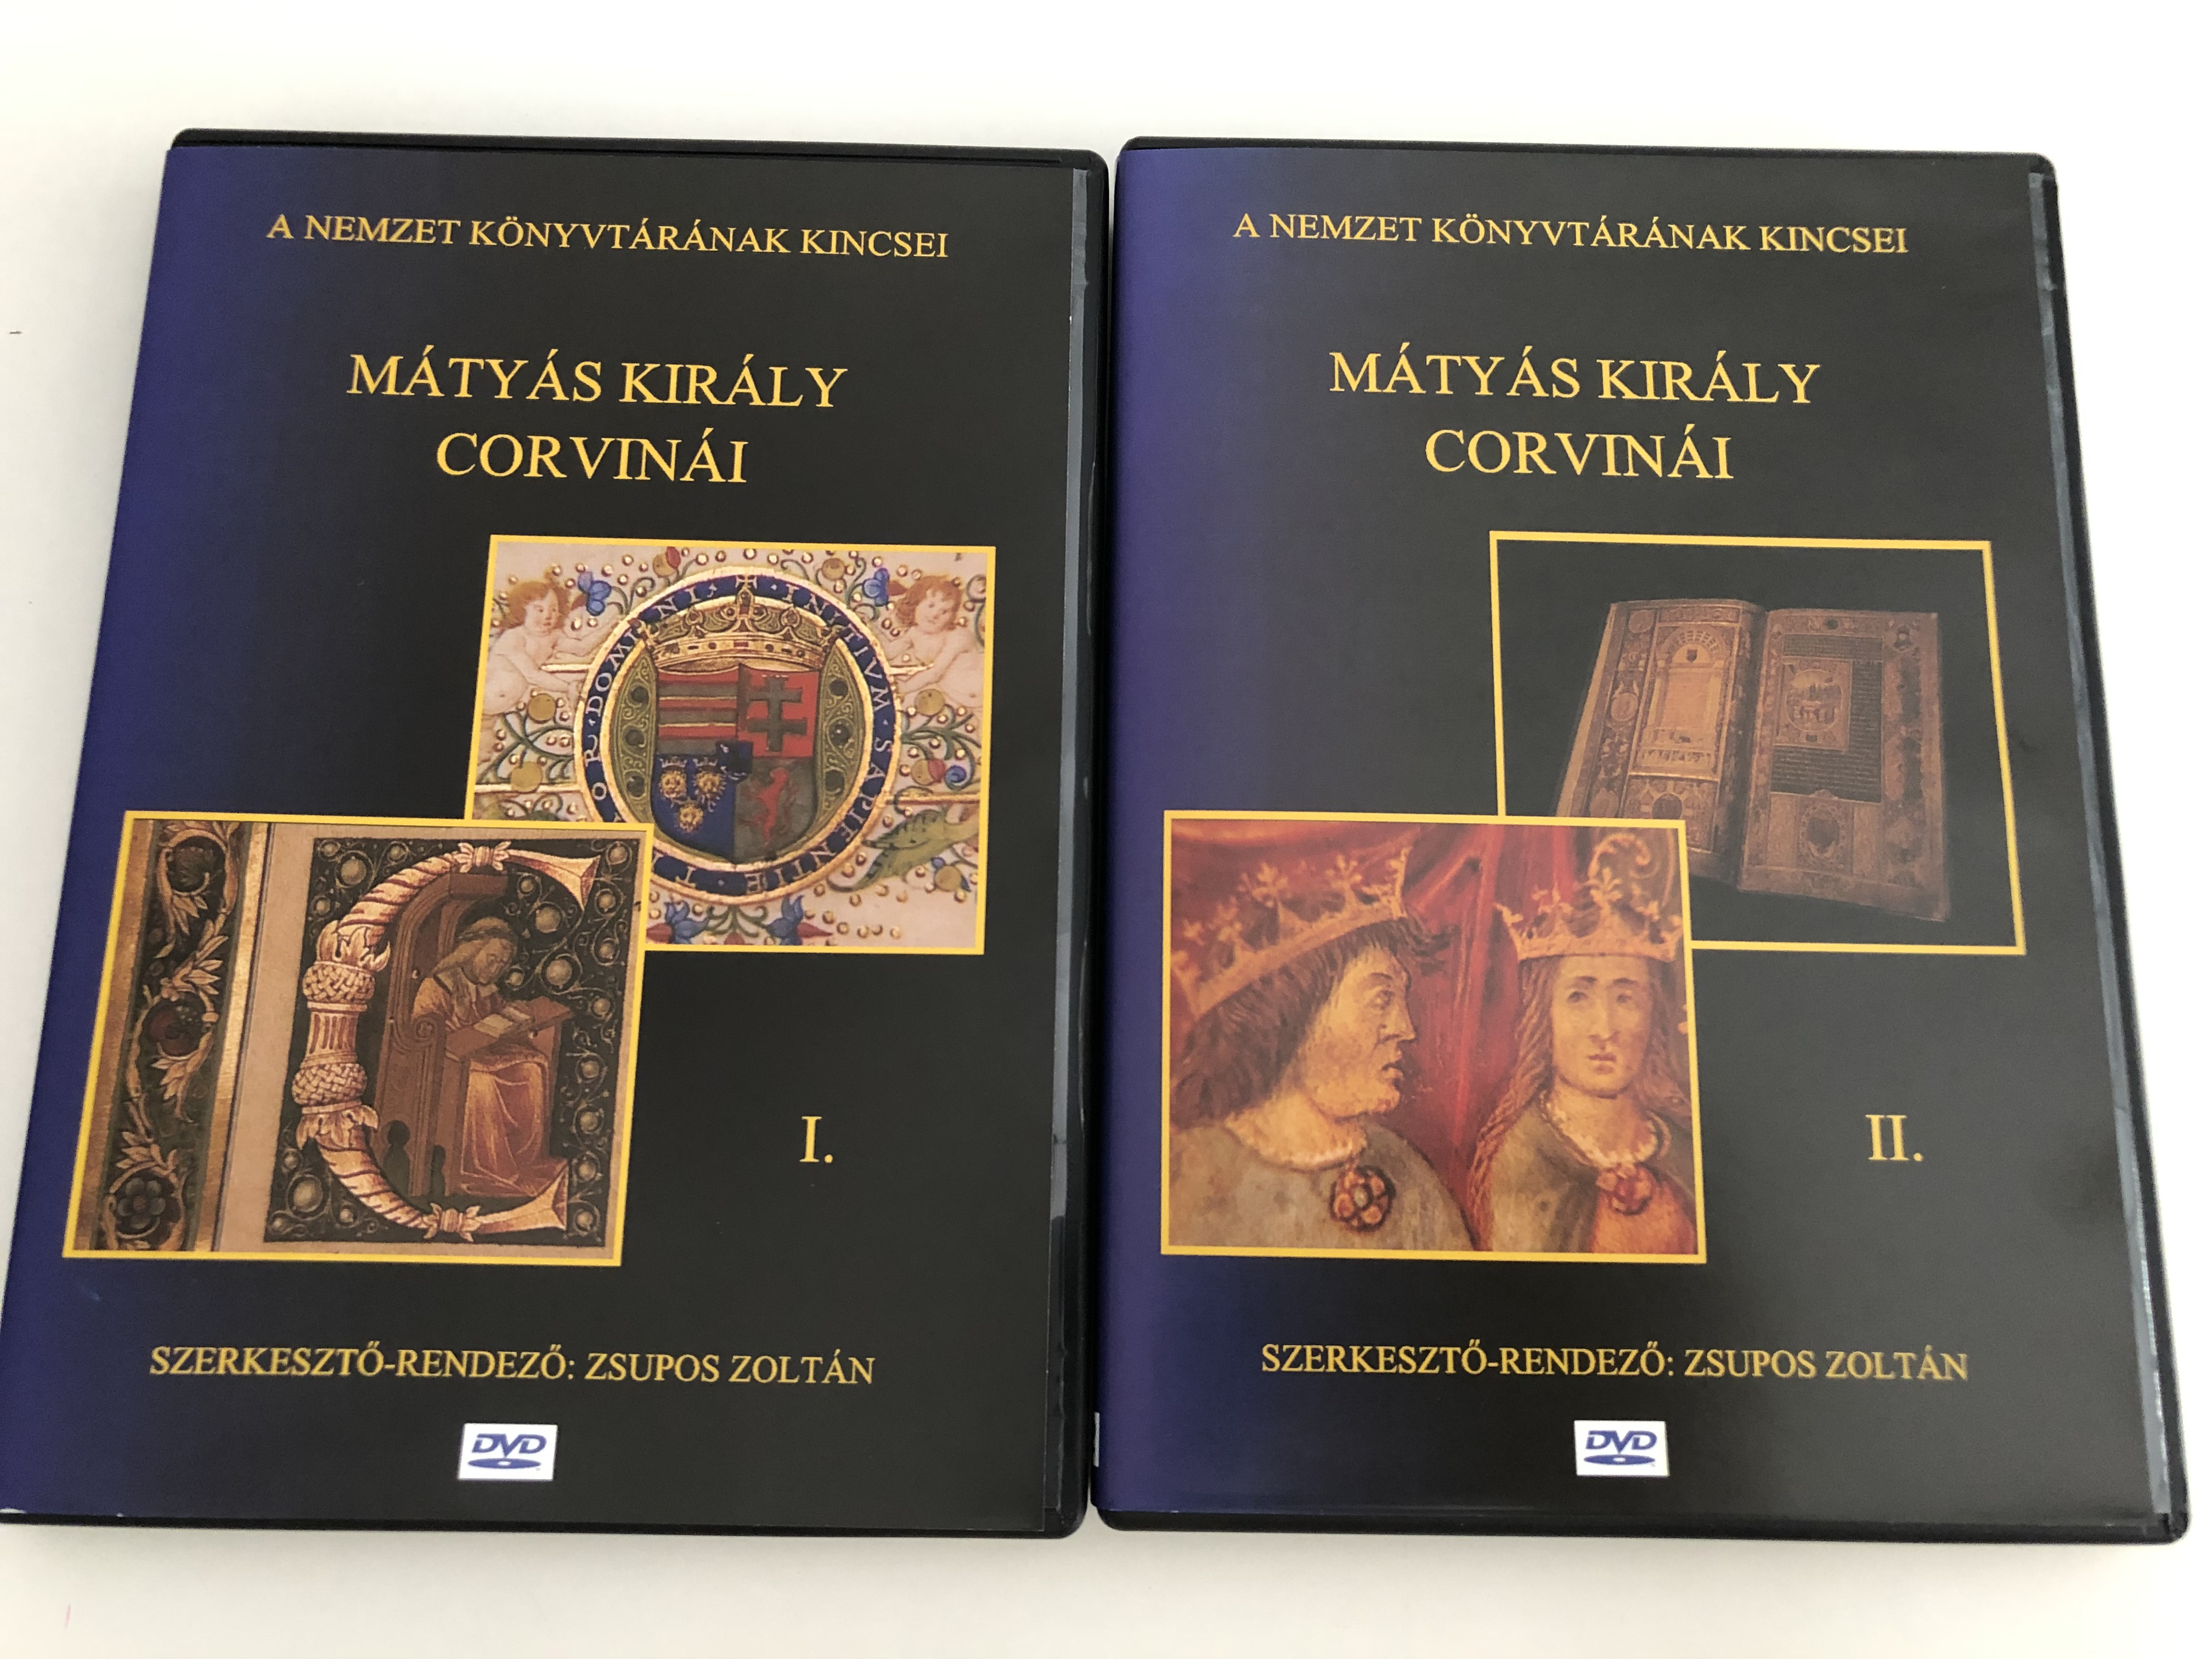 m-ty-s-kir-ly-corvin-i-dvd-set-a-nemzet-k-nyvt-r-nak-kincsei-directed-by-zsupos-zolt-n-hungarian-king-matthias-bibliotheca-corviniana-2-dvd-1-.jpg